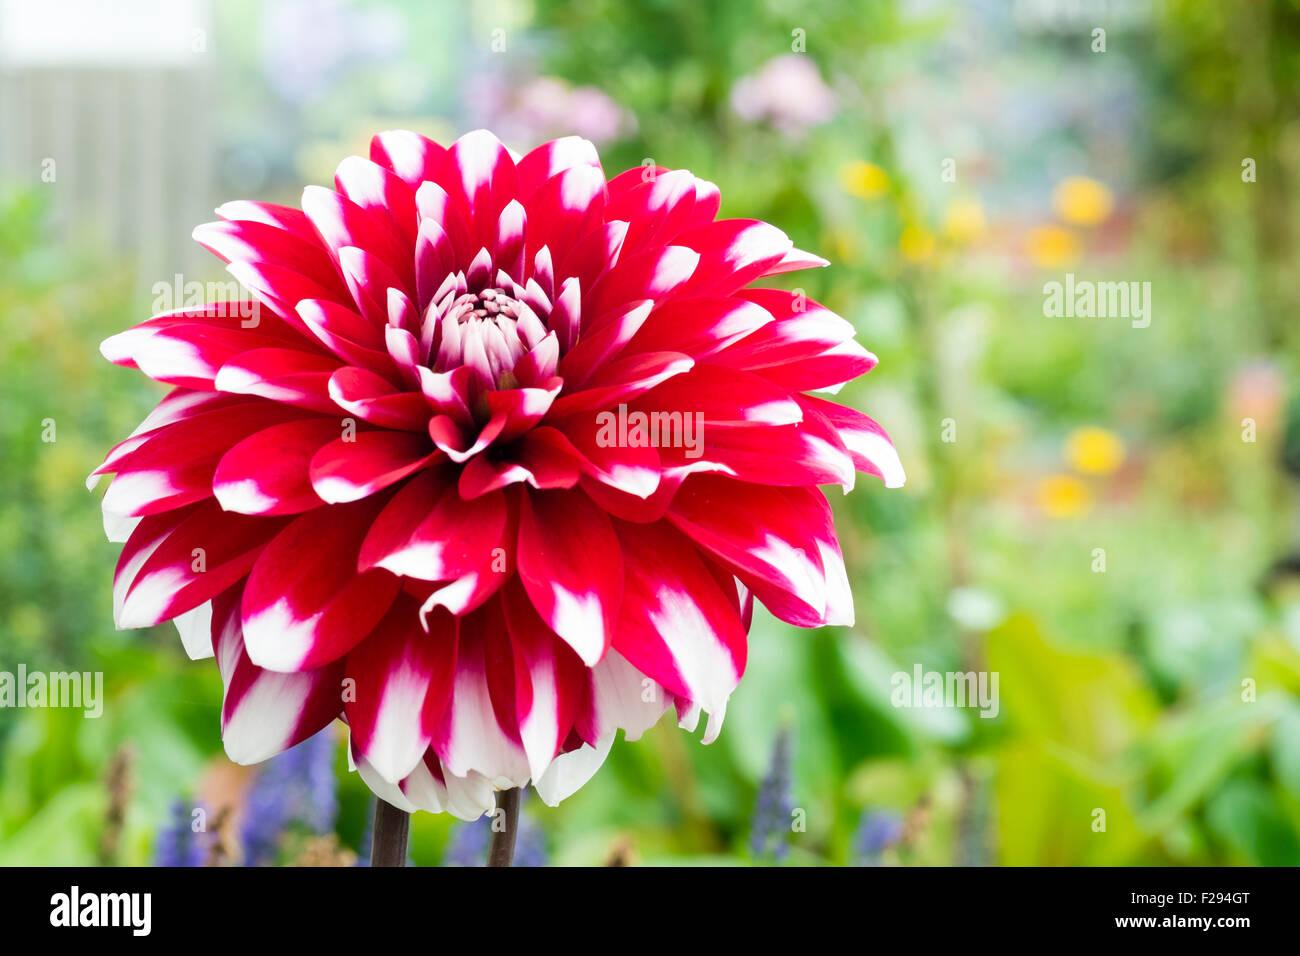 Karma stock photos karma stock images alamy dahlia karma ying yang red white flower uk stock image izmirmasajfo